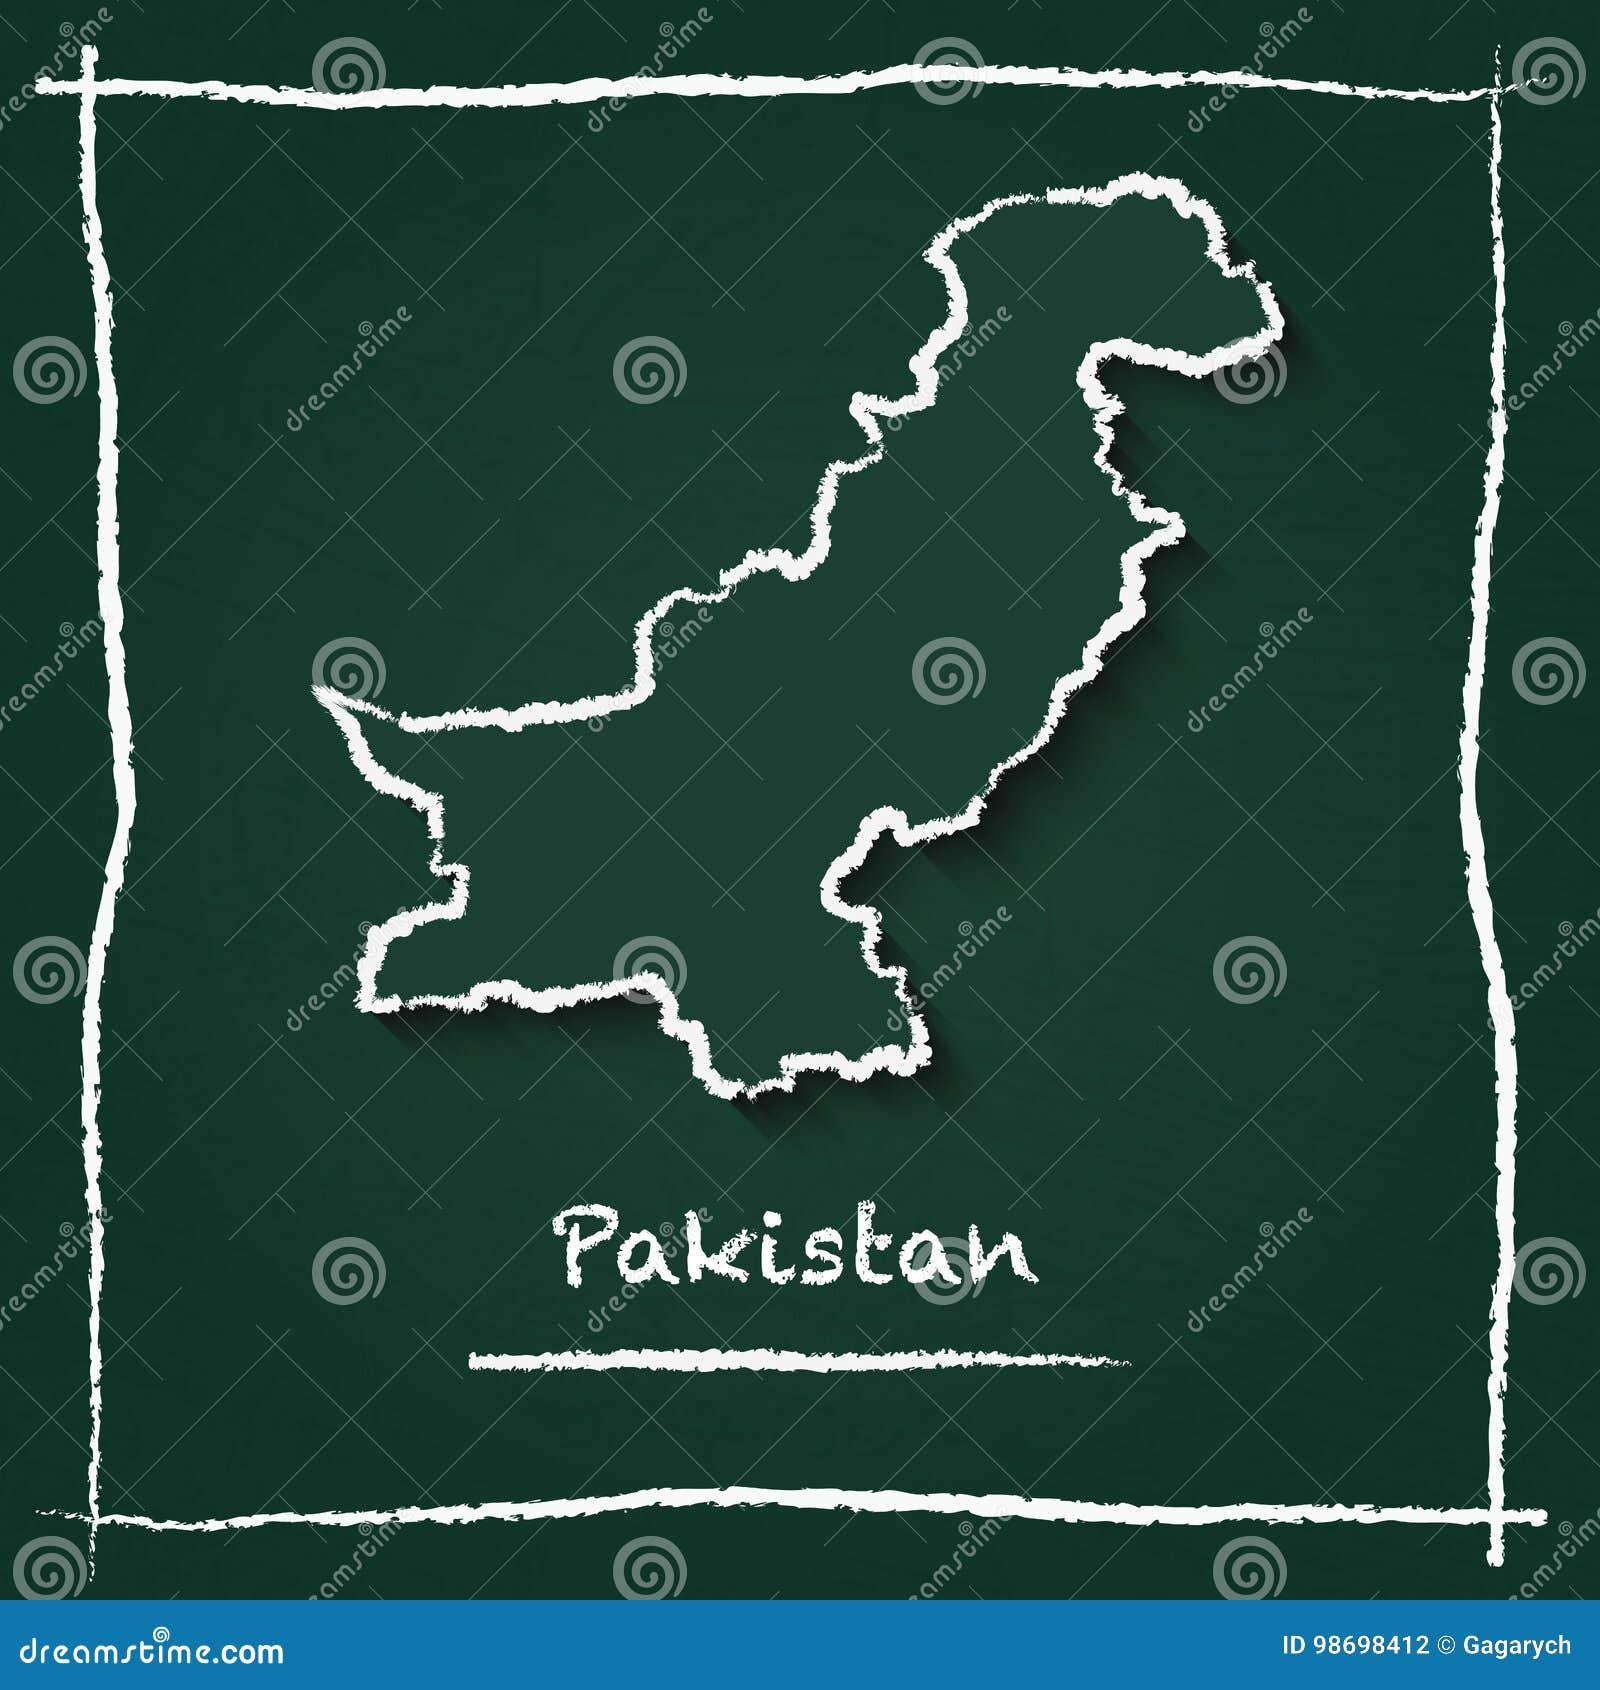 Islamic Republic Of Pakistan Outline Vector Map  Stock